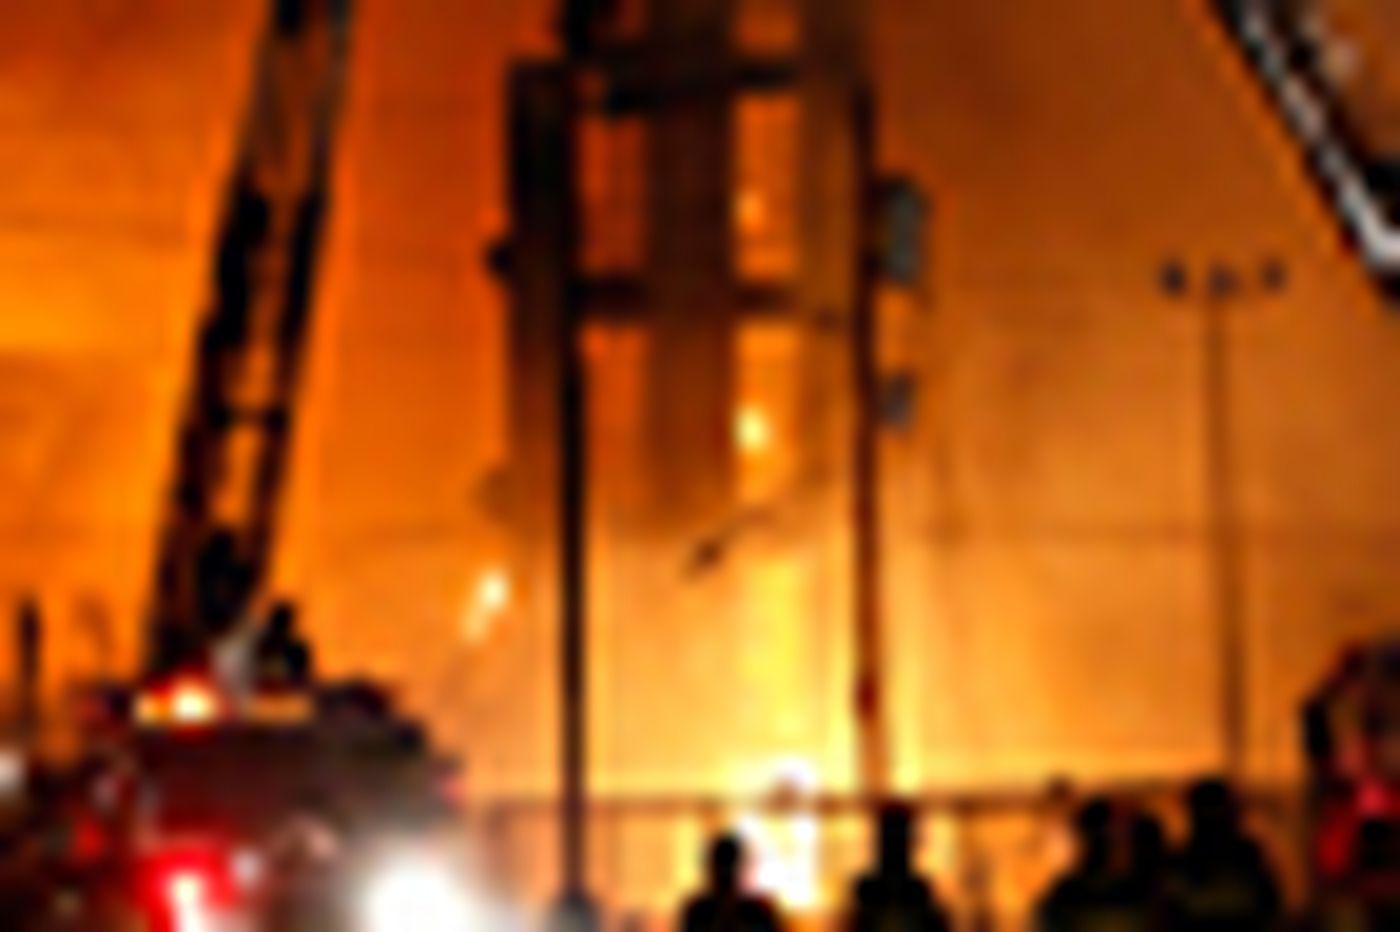 A grand jury will probe a Kensington blaze that killed two firefighters